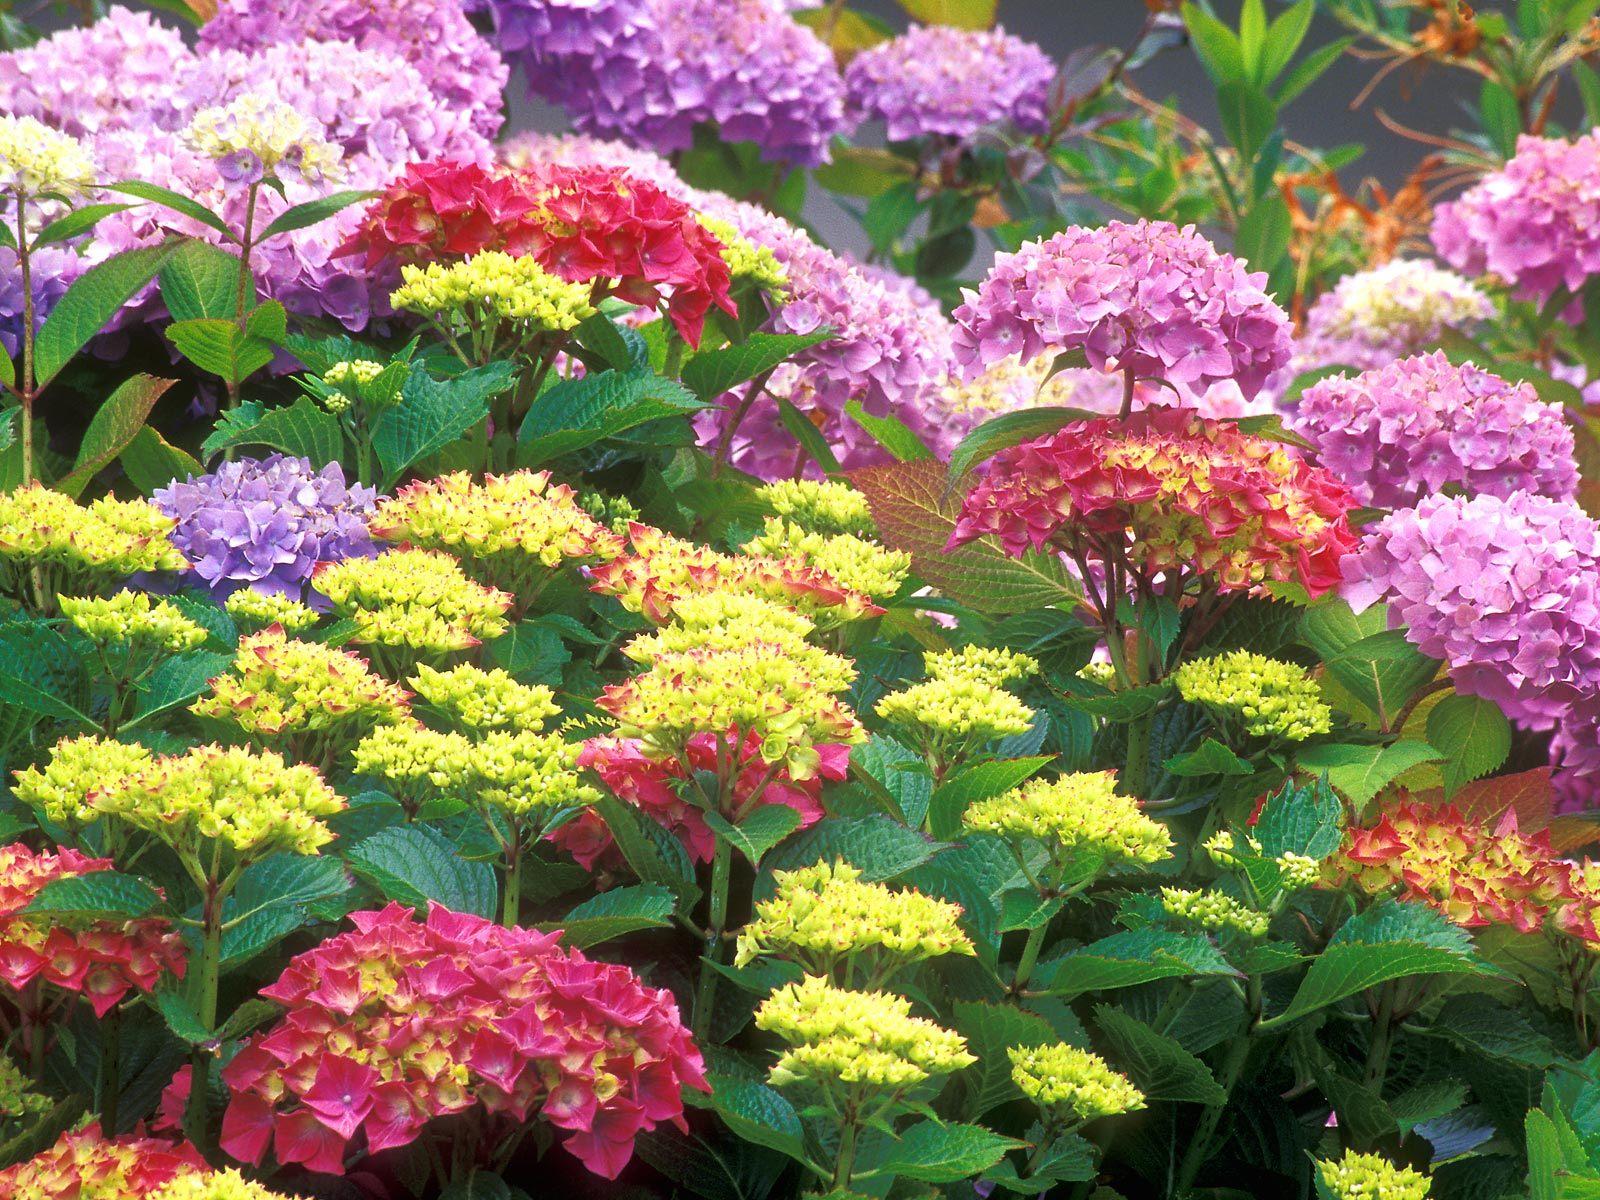 Многолетние цветы, высаживаемые вдоль ...: bytrina11.ru/posadki-mnogoletnih-tsvetov-vdol-dorozhek